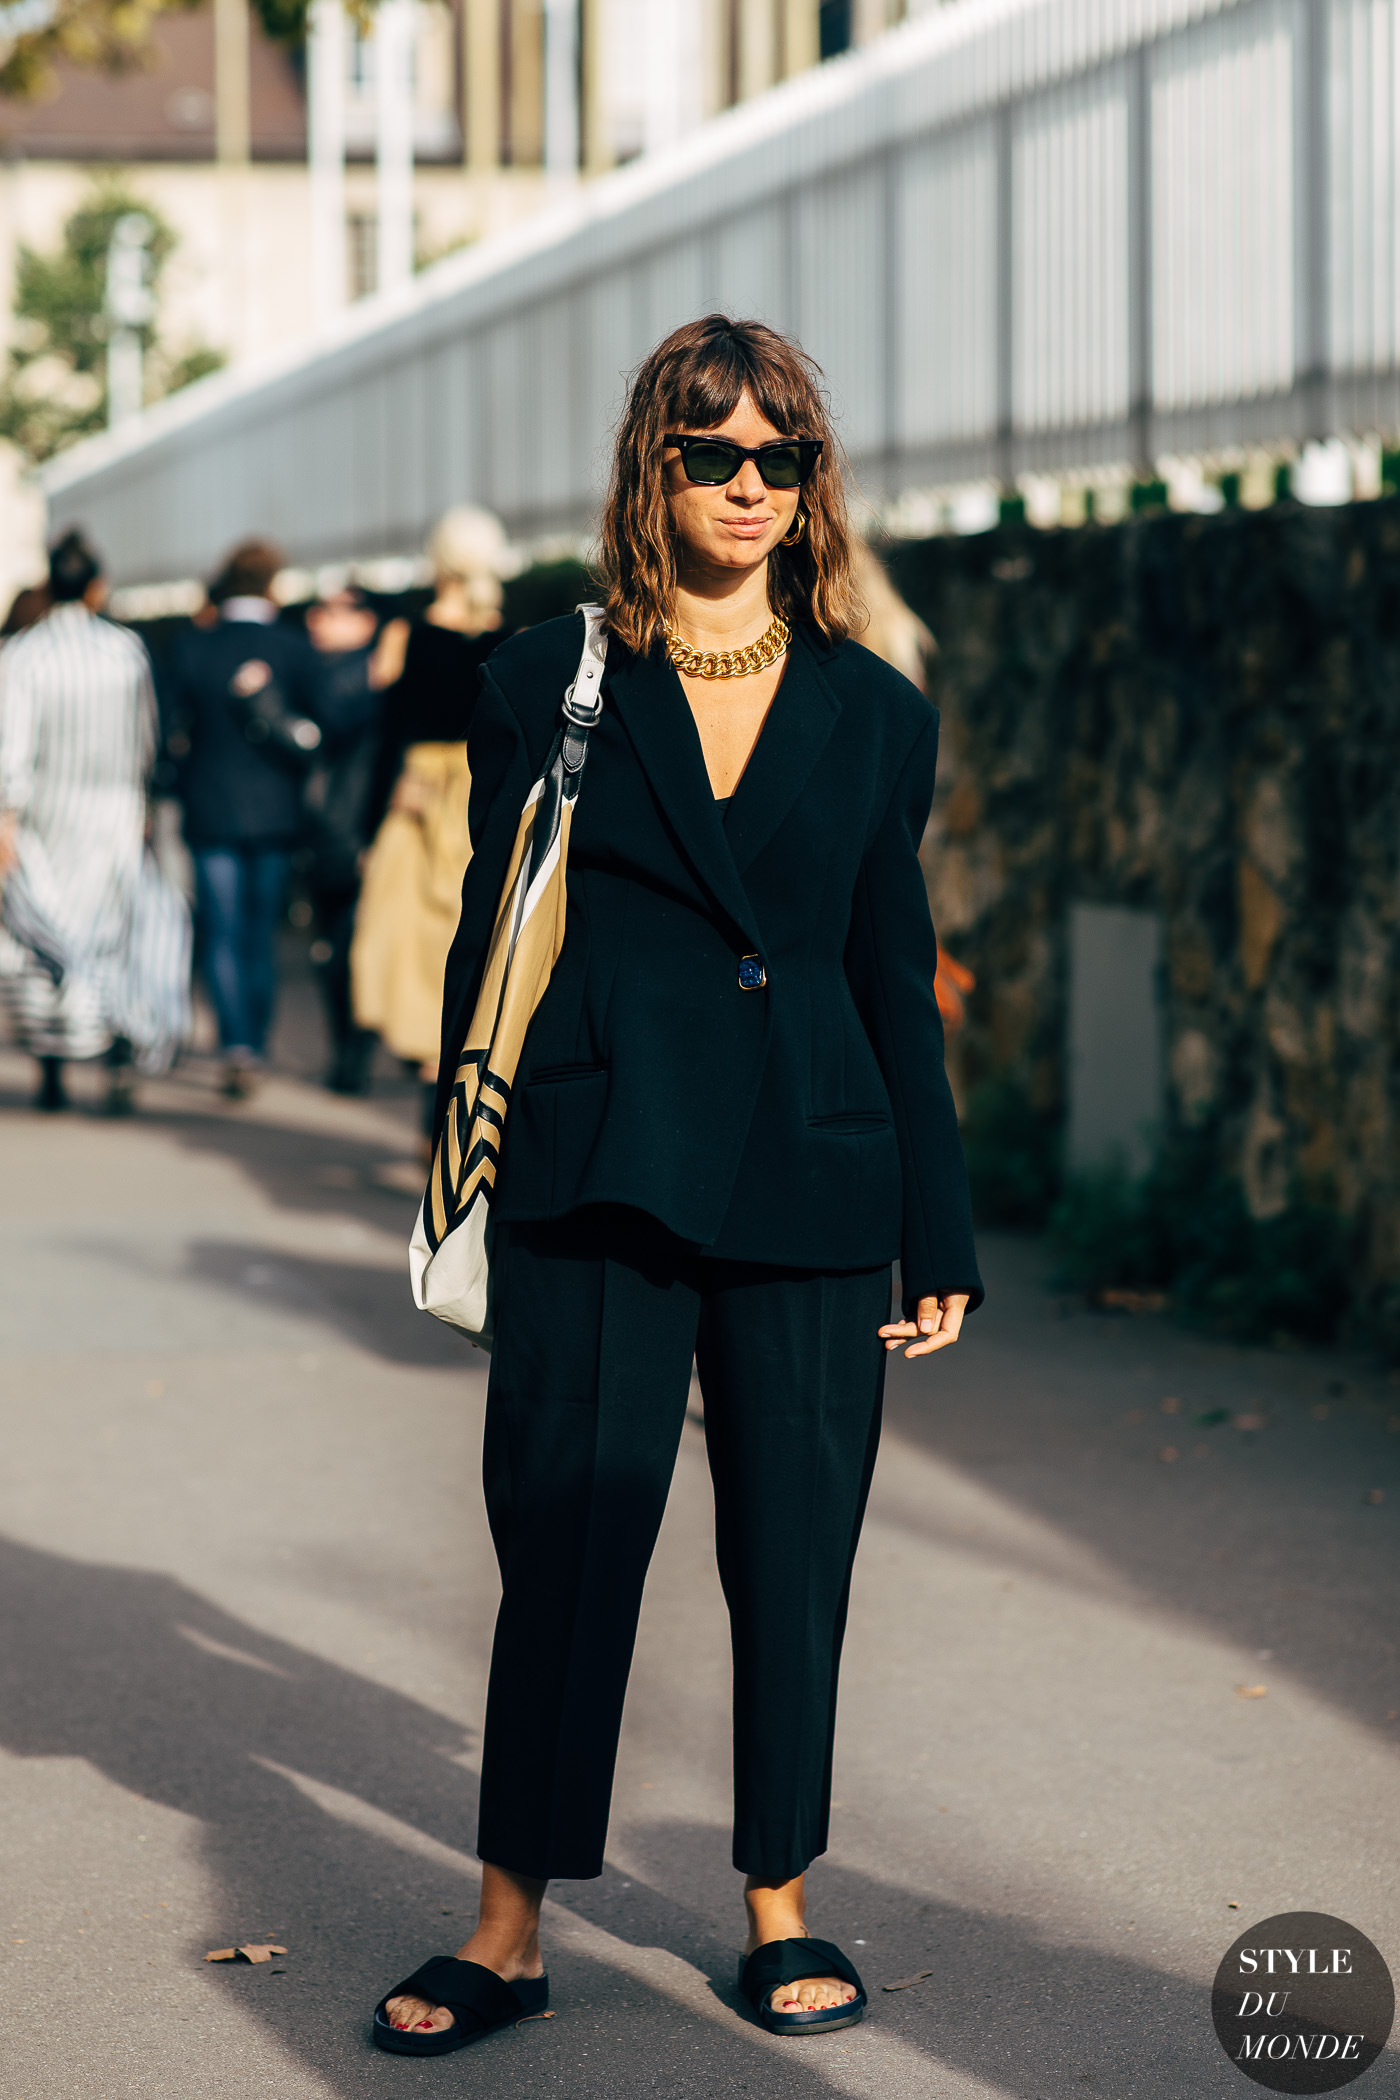 Paris SS 2019 Street Style: Natasha Goldenberg - STYLE DU